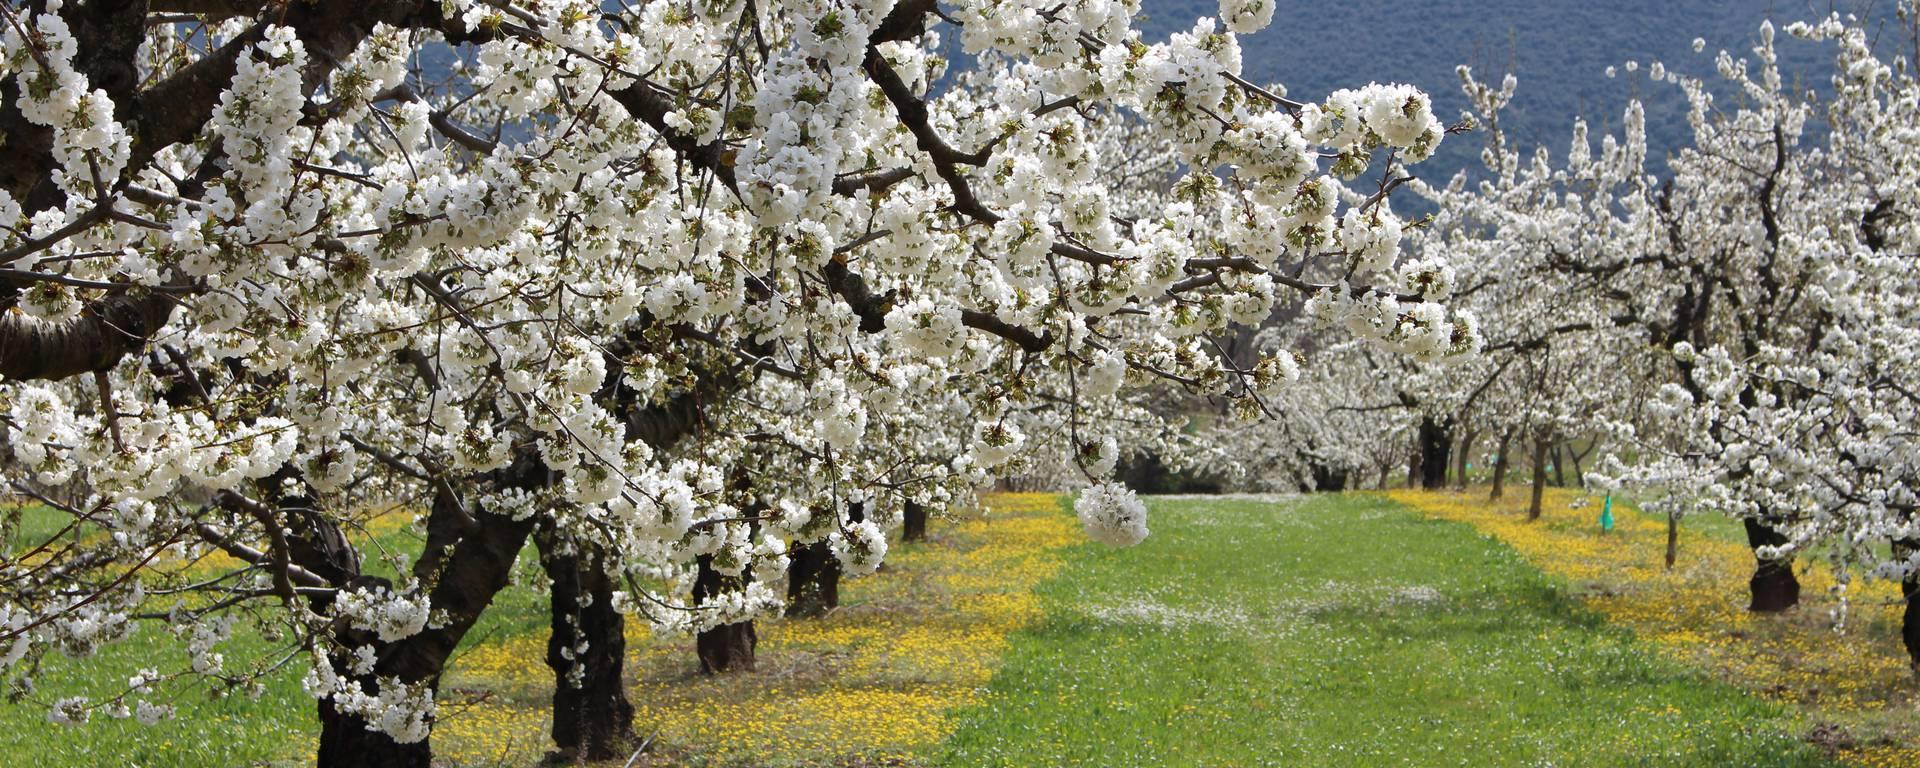 champ cerisier luberon provence cerises printemps